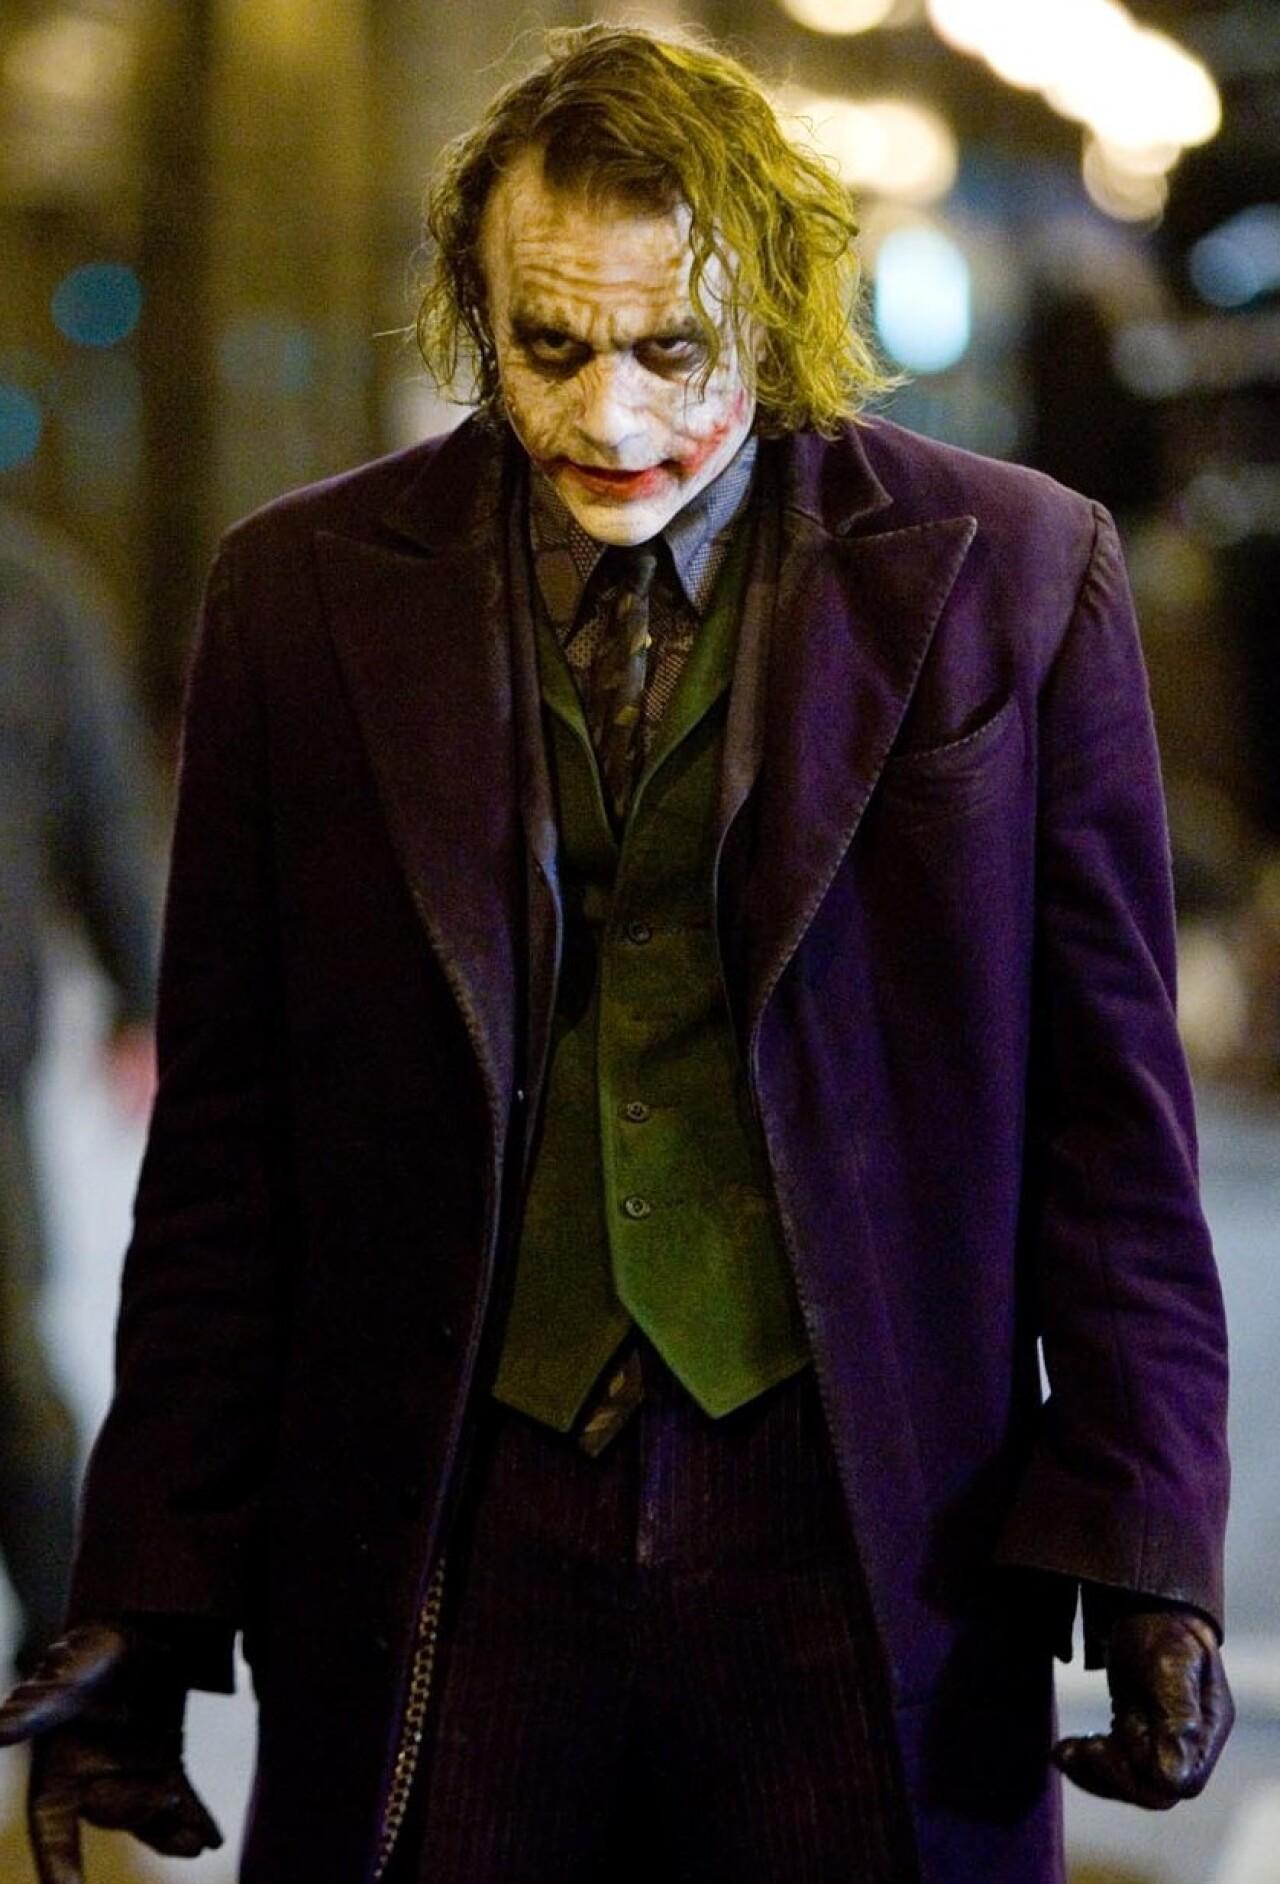 Brand New Batman The Dark Knight Rises The Joker Adult Mask with Hair